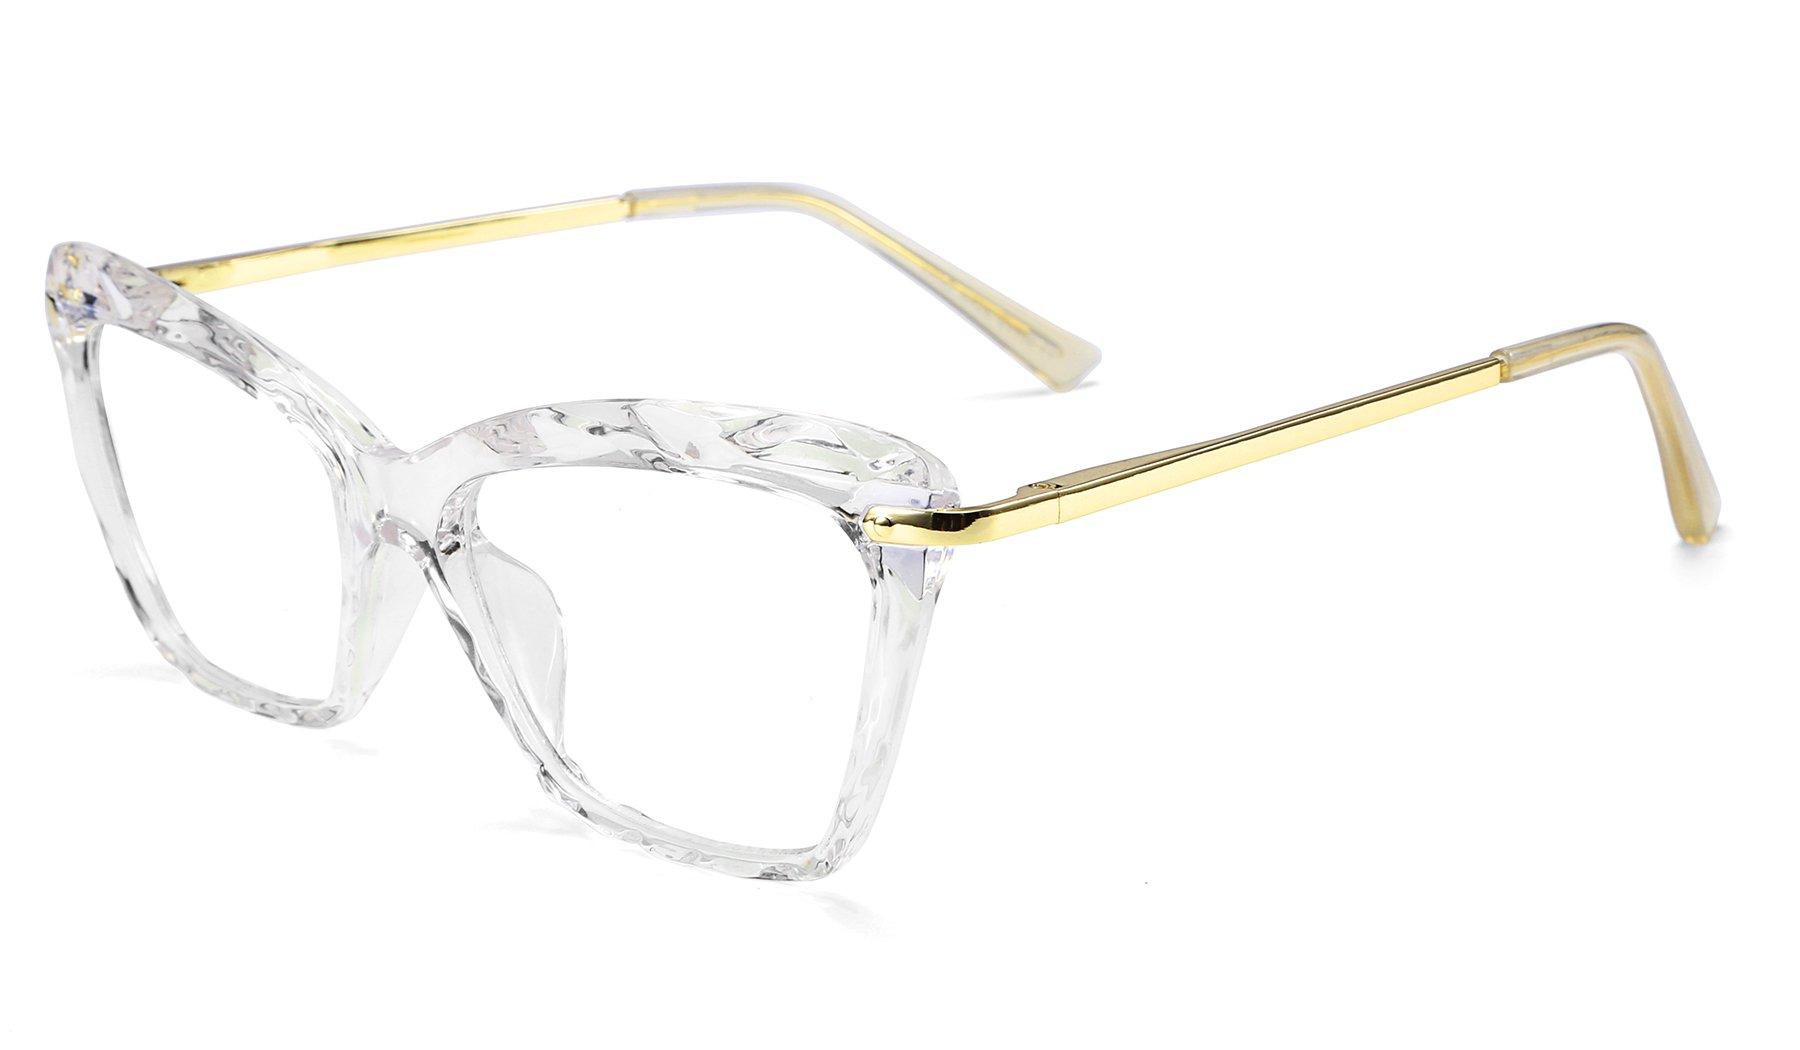 edabd40e0d12 FEISEDY Cat Eye Crystal Optical Eyewear Non Prescription Eyeglasses Frame  for Women B2440